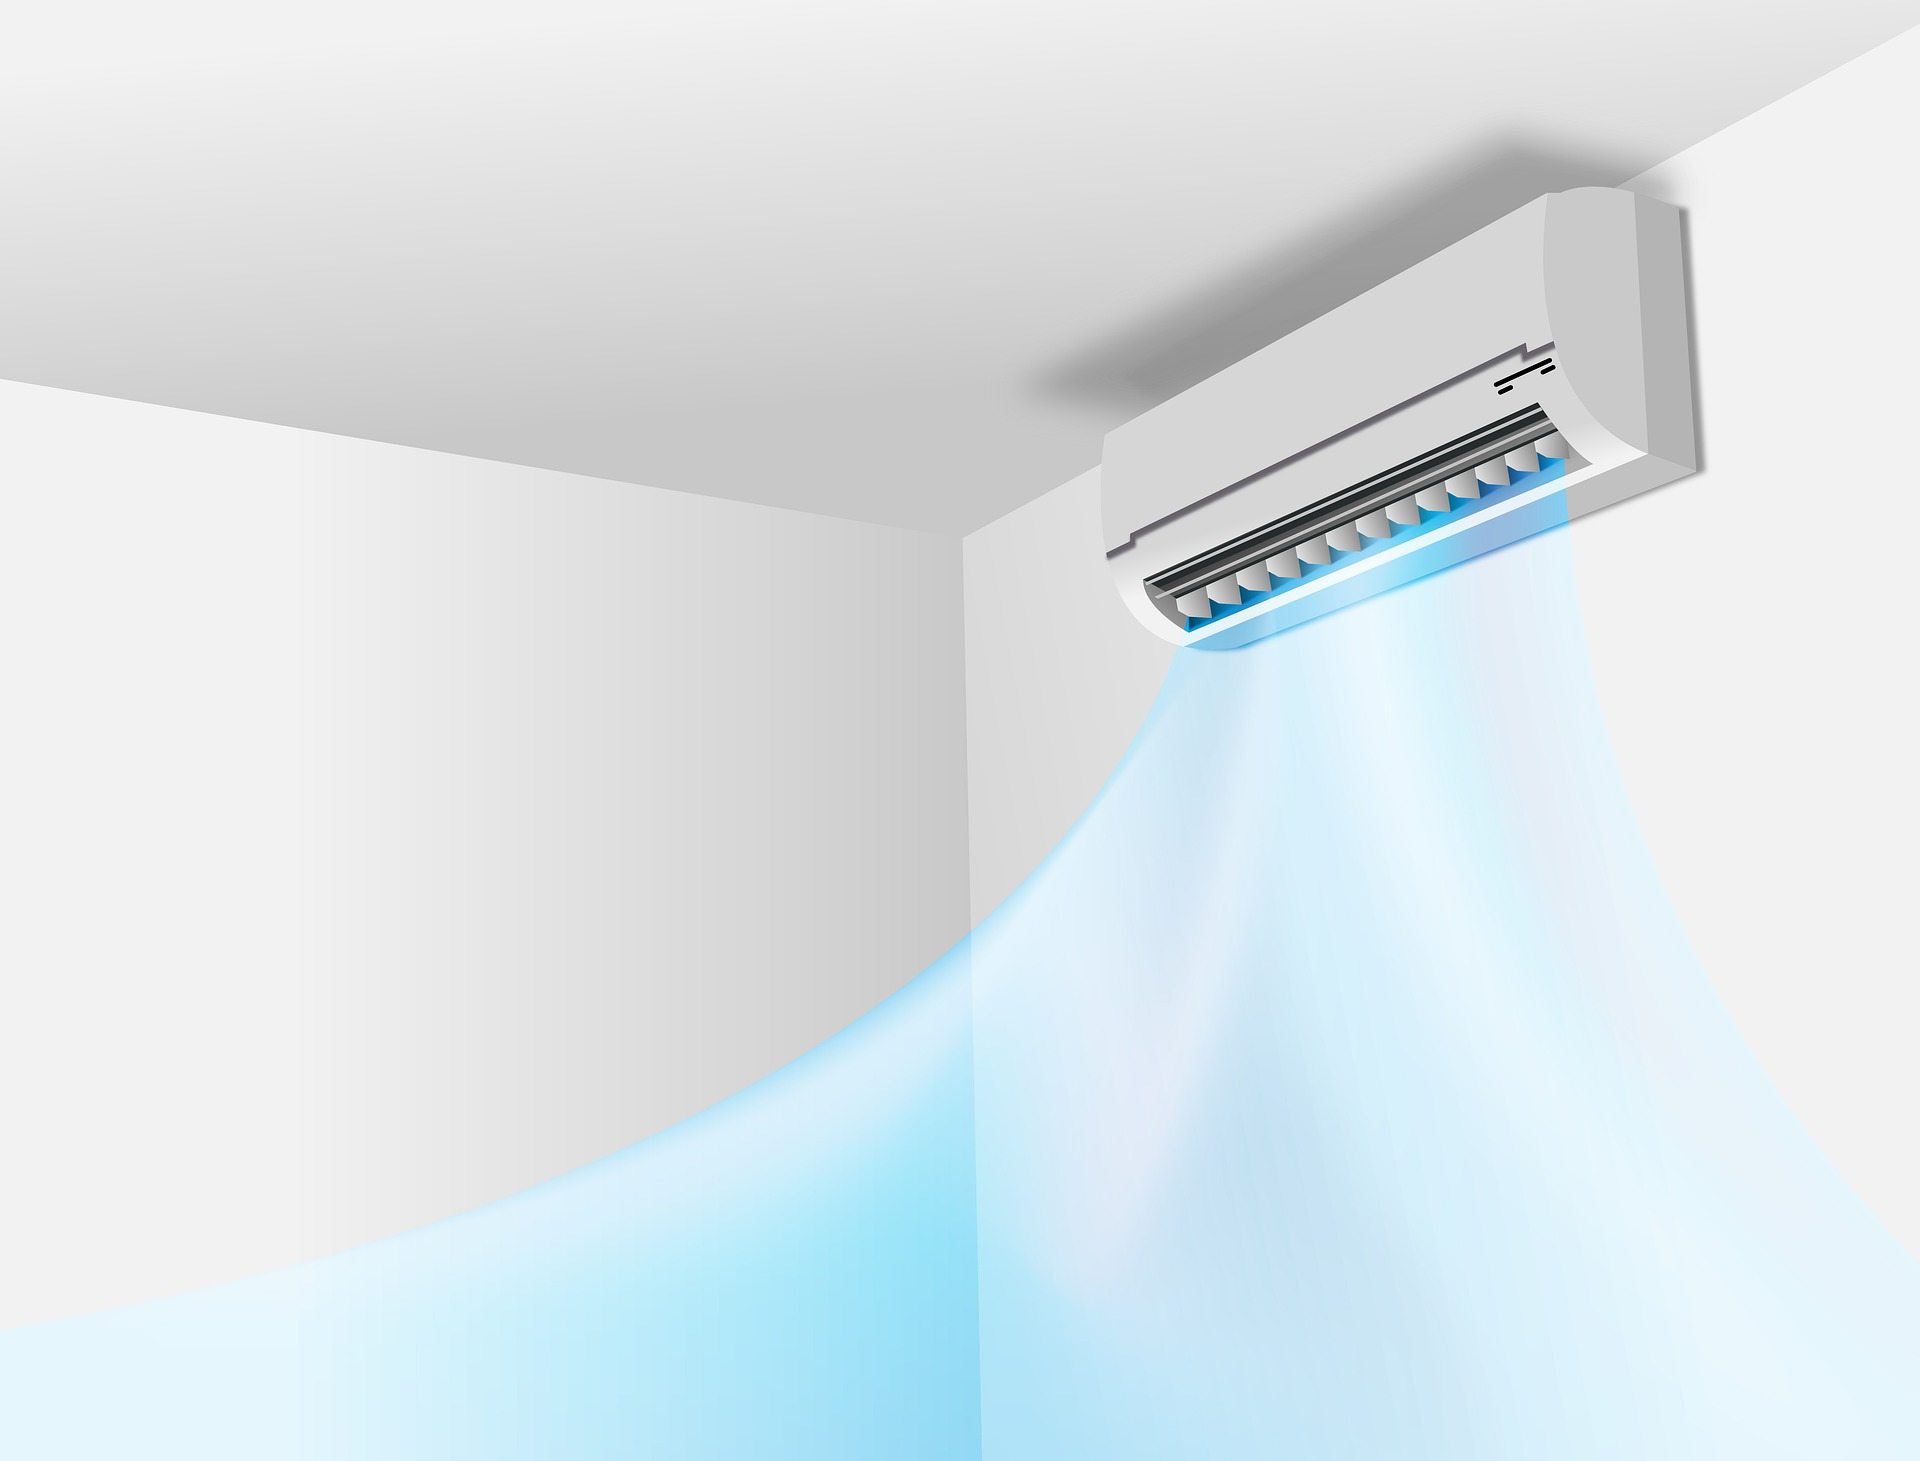 Air-conditioning unit illustration